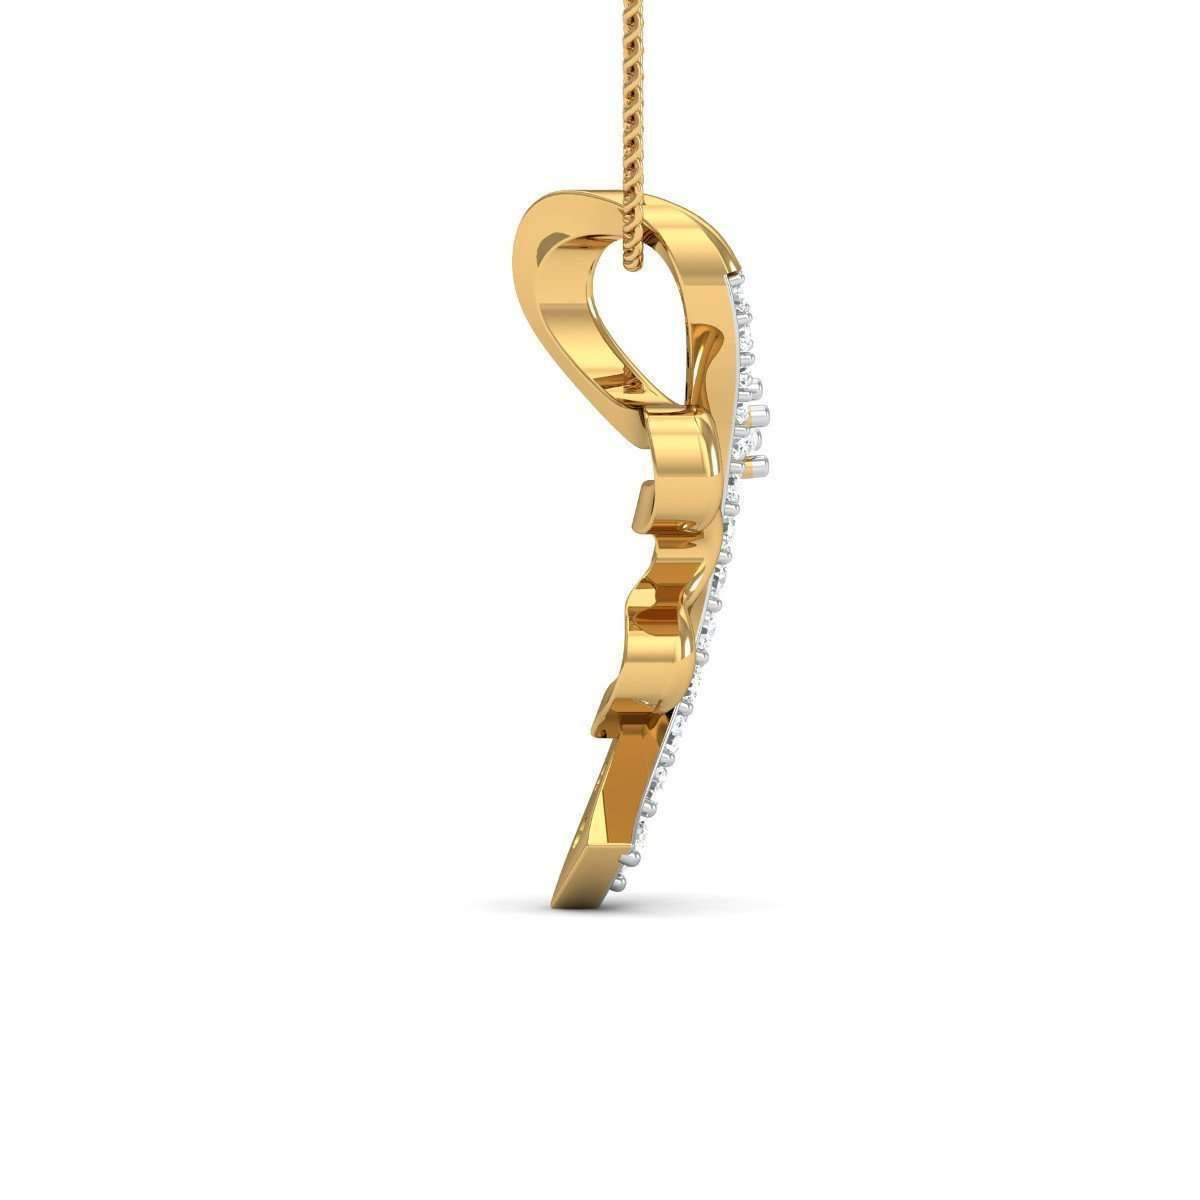 Diamoire Jewels Beauteous Diamond Pendant in 18kt Yellow Gold 8TNKHKa